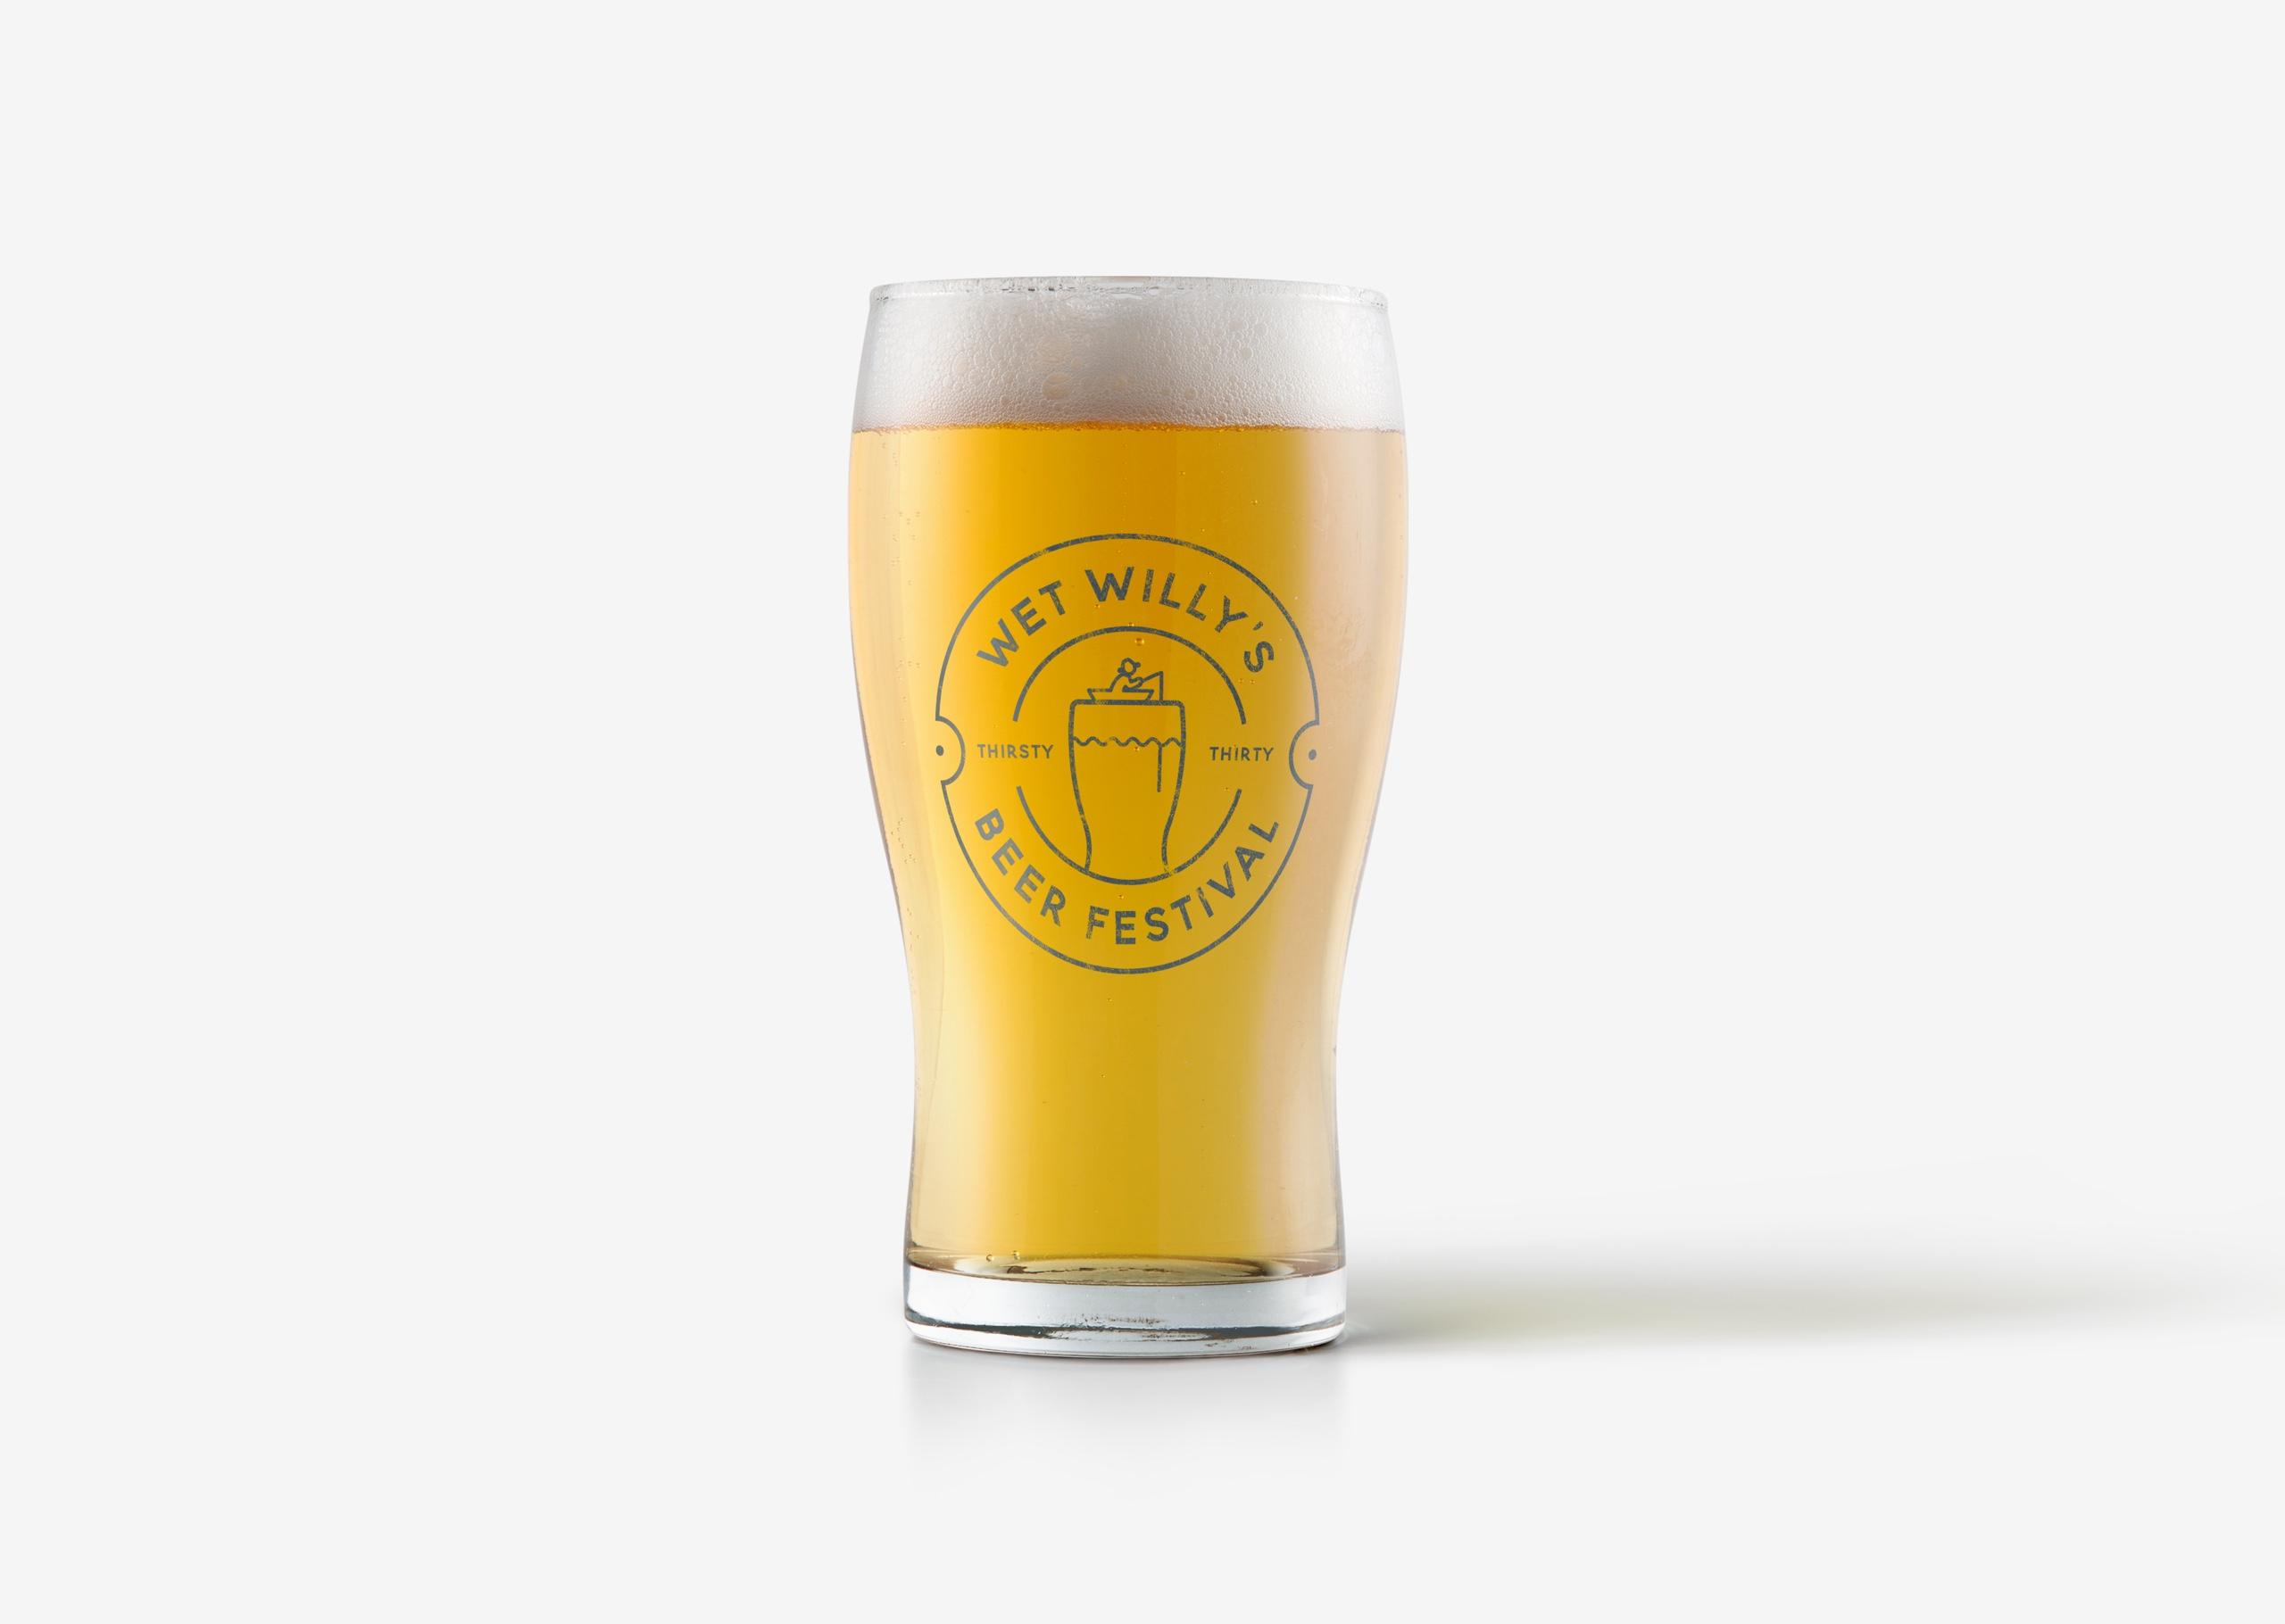 Beer glass design for Wet Willy's Beer Festival